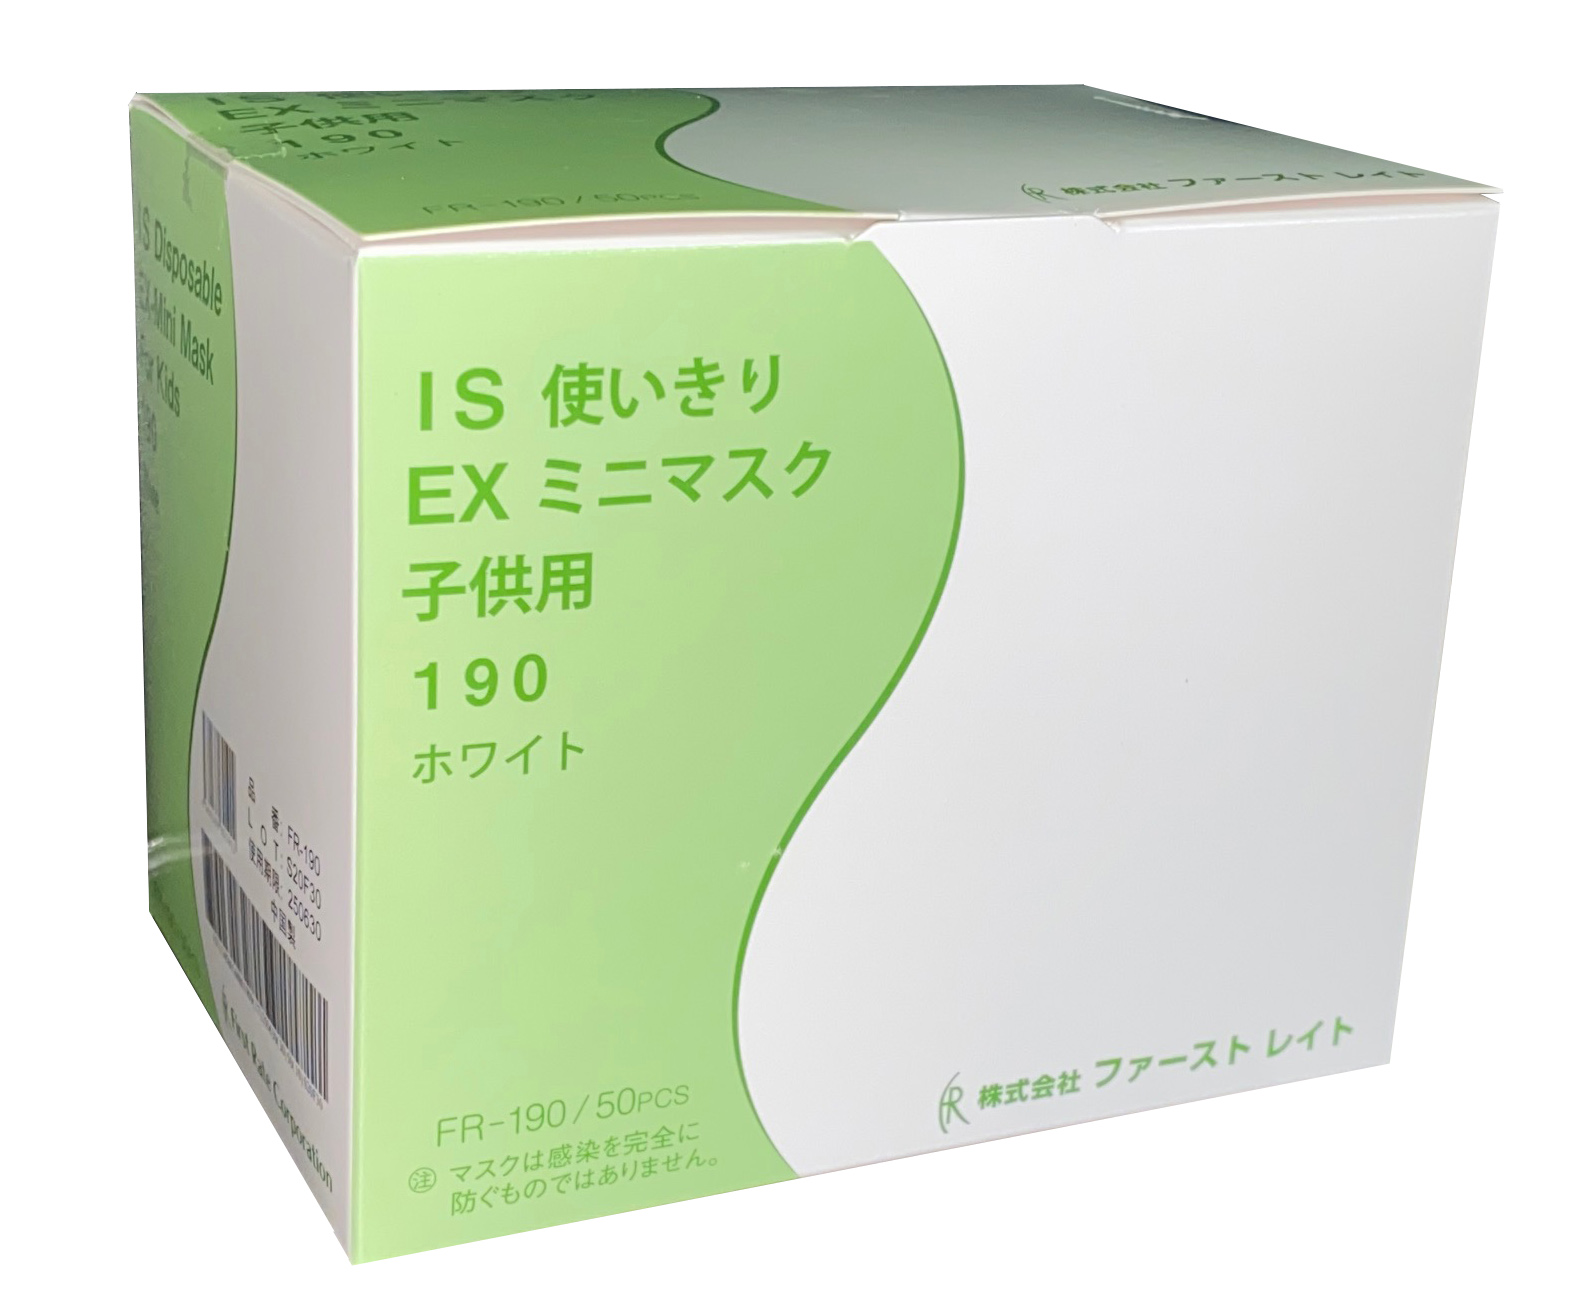 IS 使い切り 幼児用EXミニマスク 50枚入×40箱/ホワイト